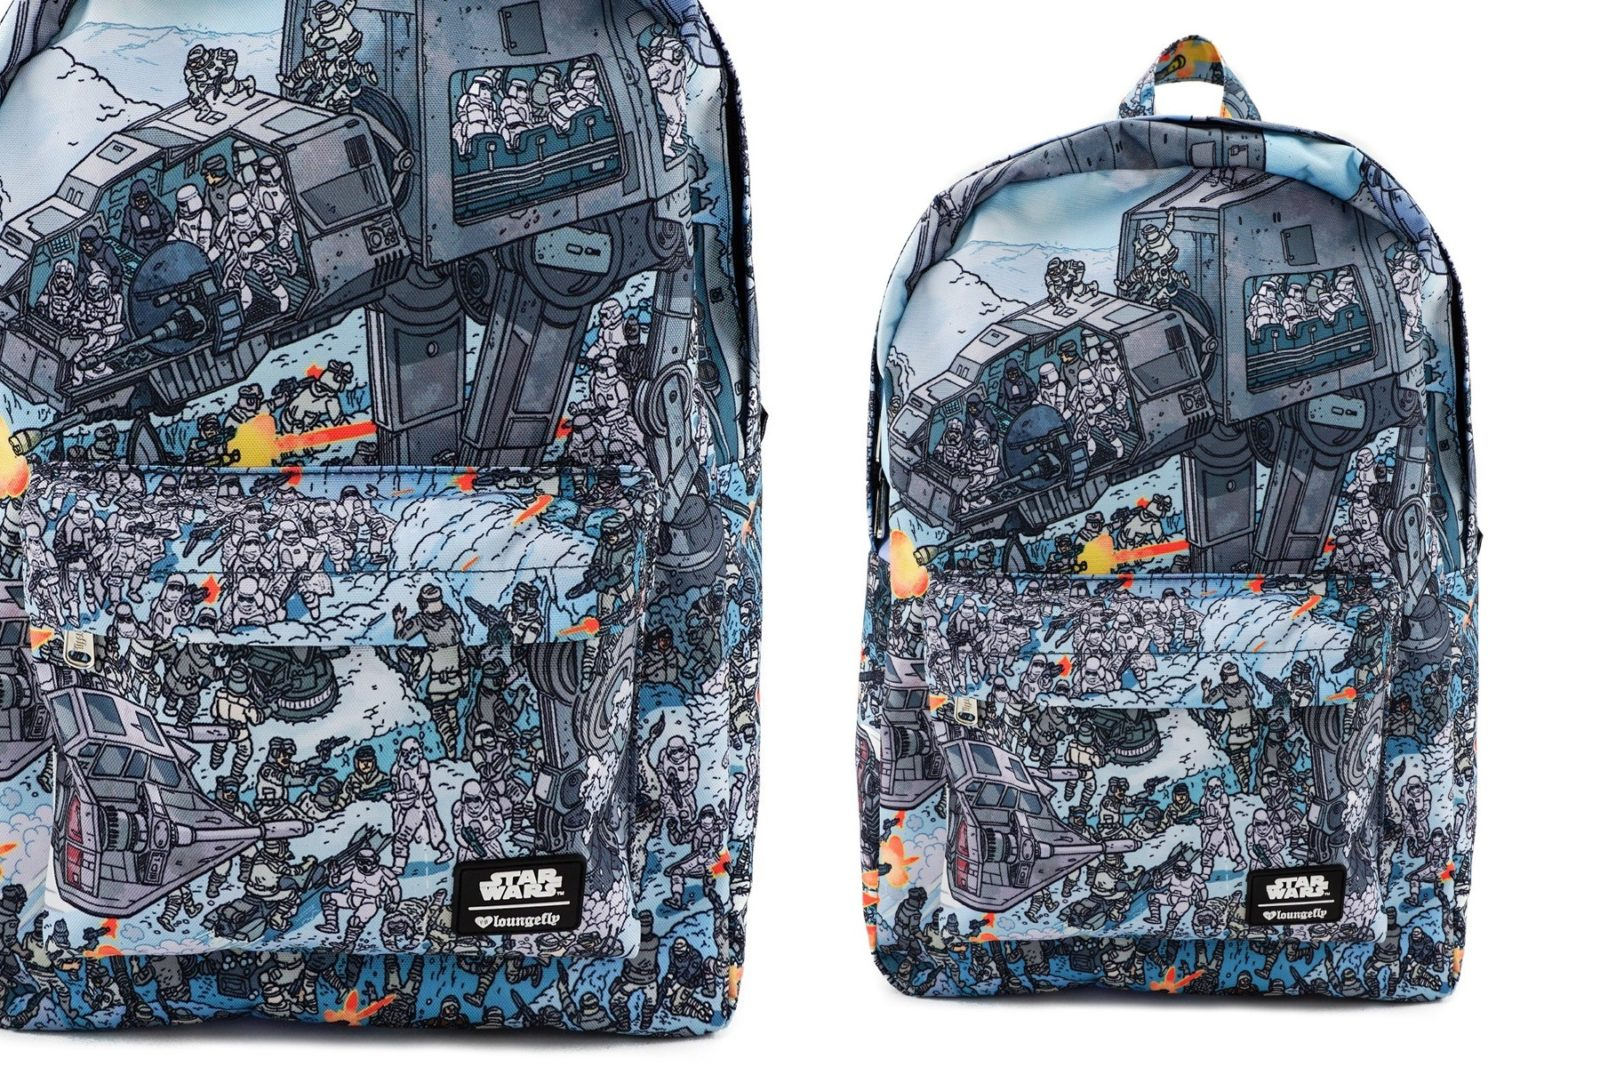 Loungefly x Star Wars Hoth AT-AT Backpack